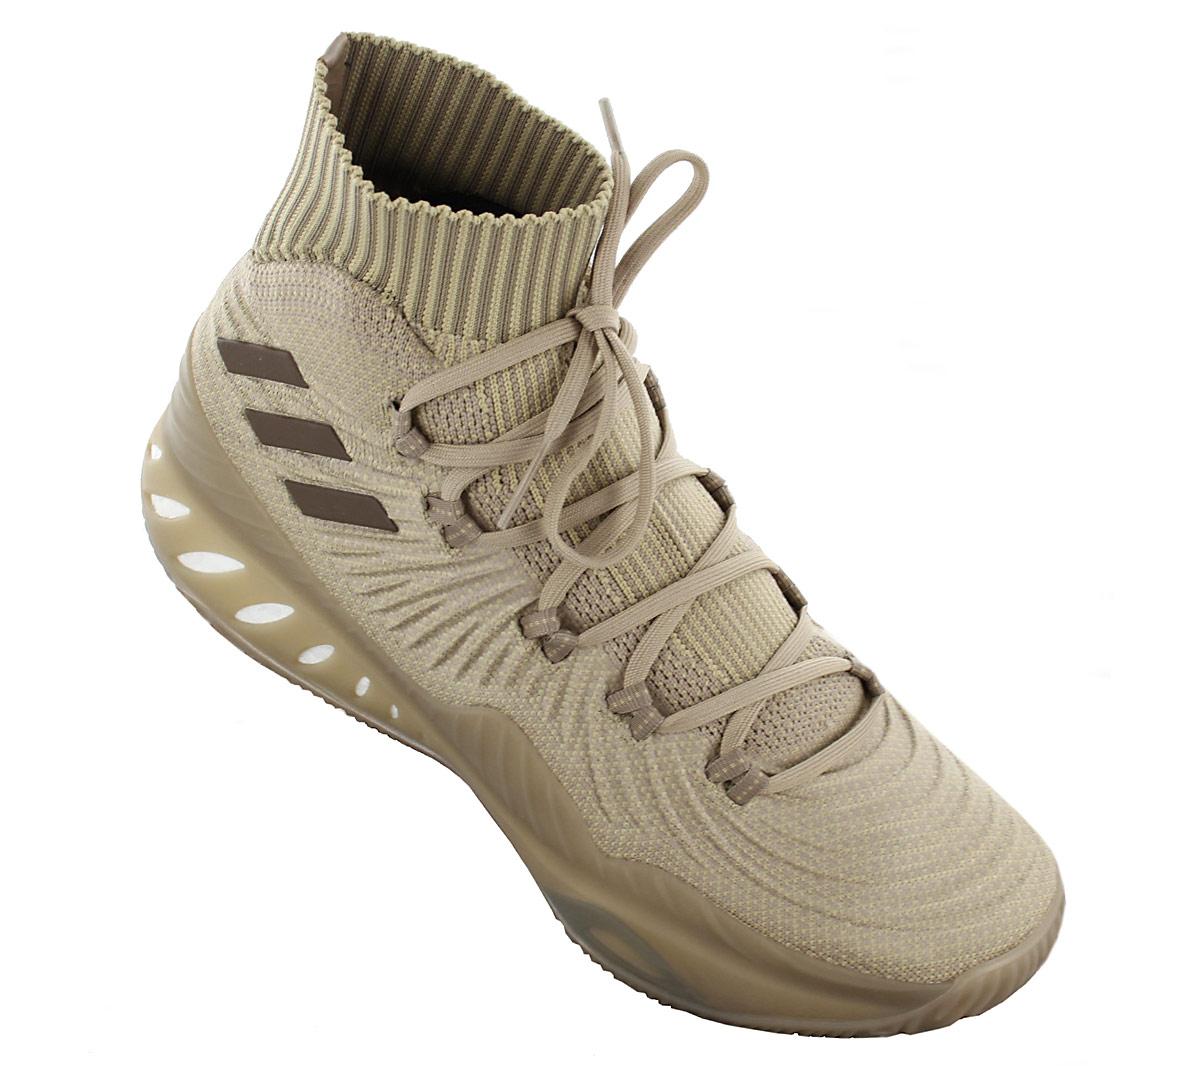 online store 182da b772b Adidas Crazy Explosive 2017 Pk Primeknit Mens Baketball Shoe